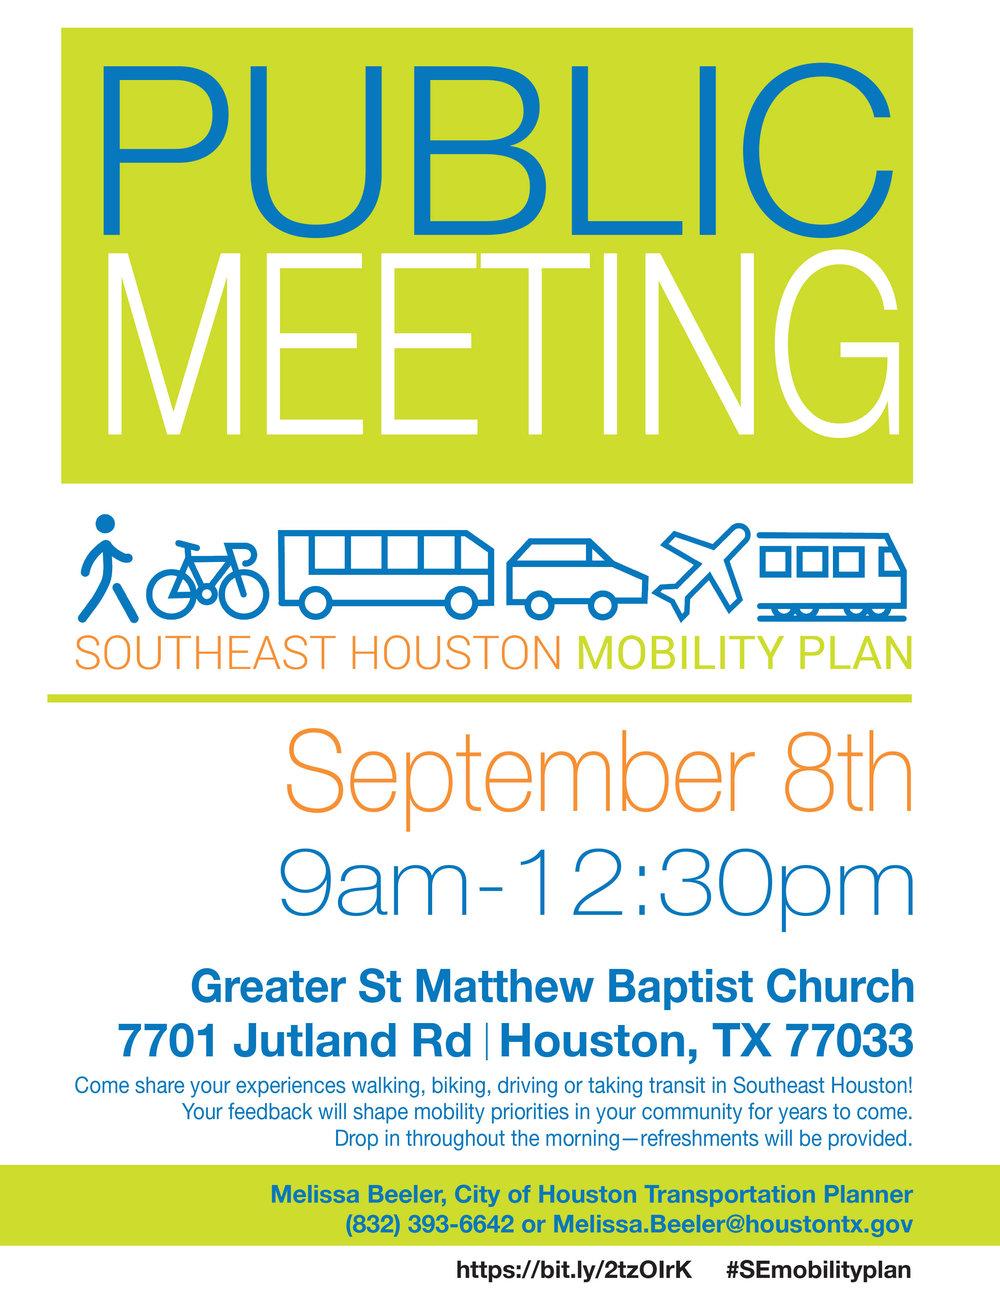 SEmobility_public meeting.jpg